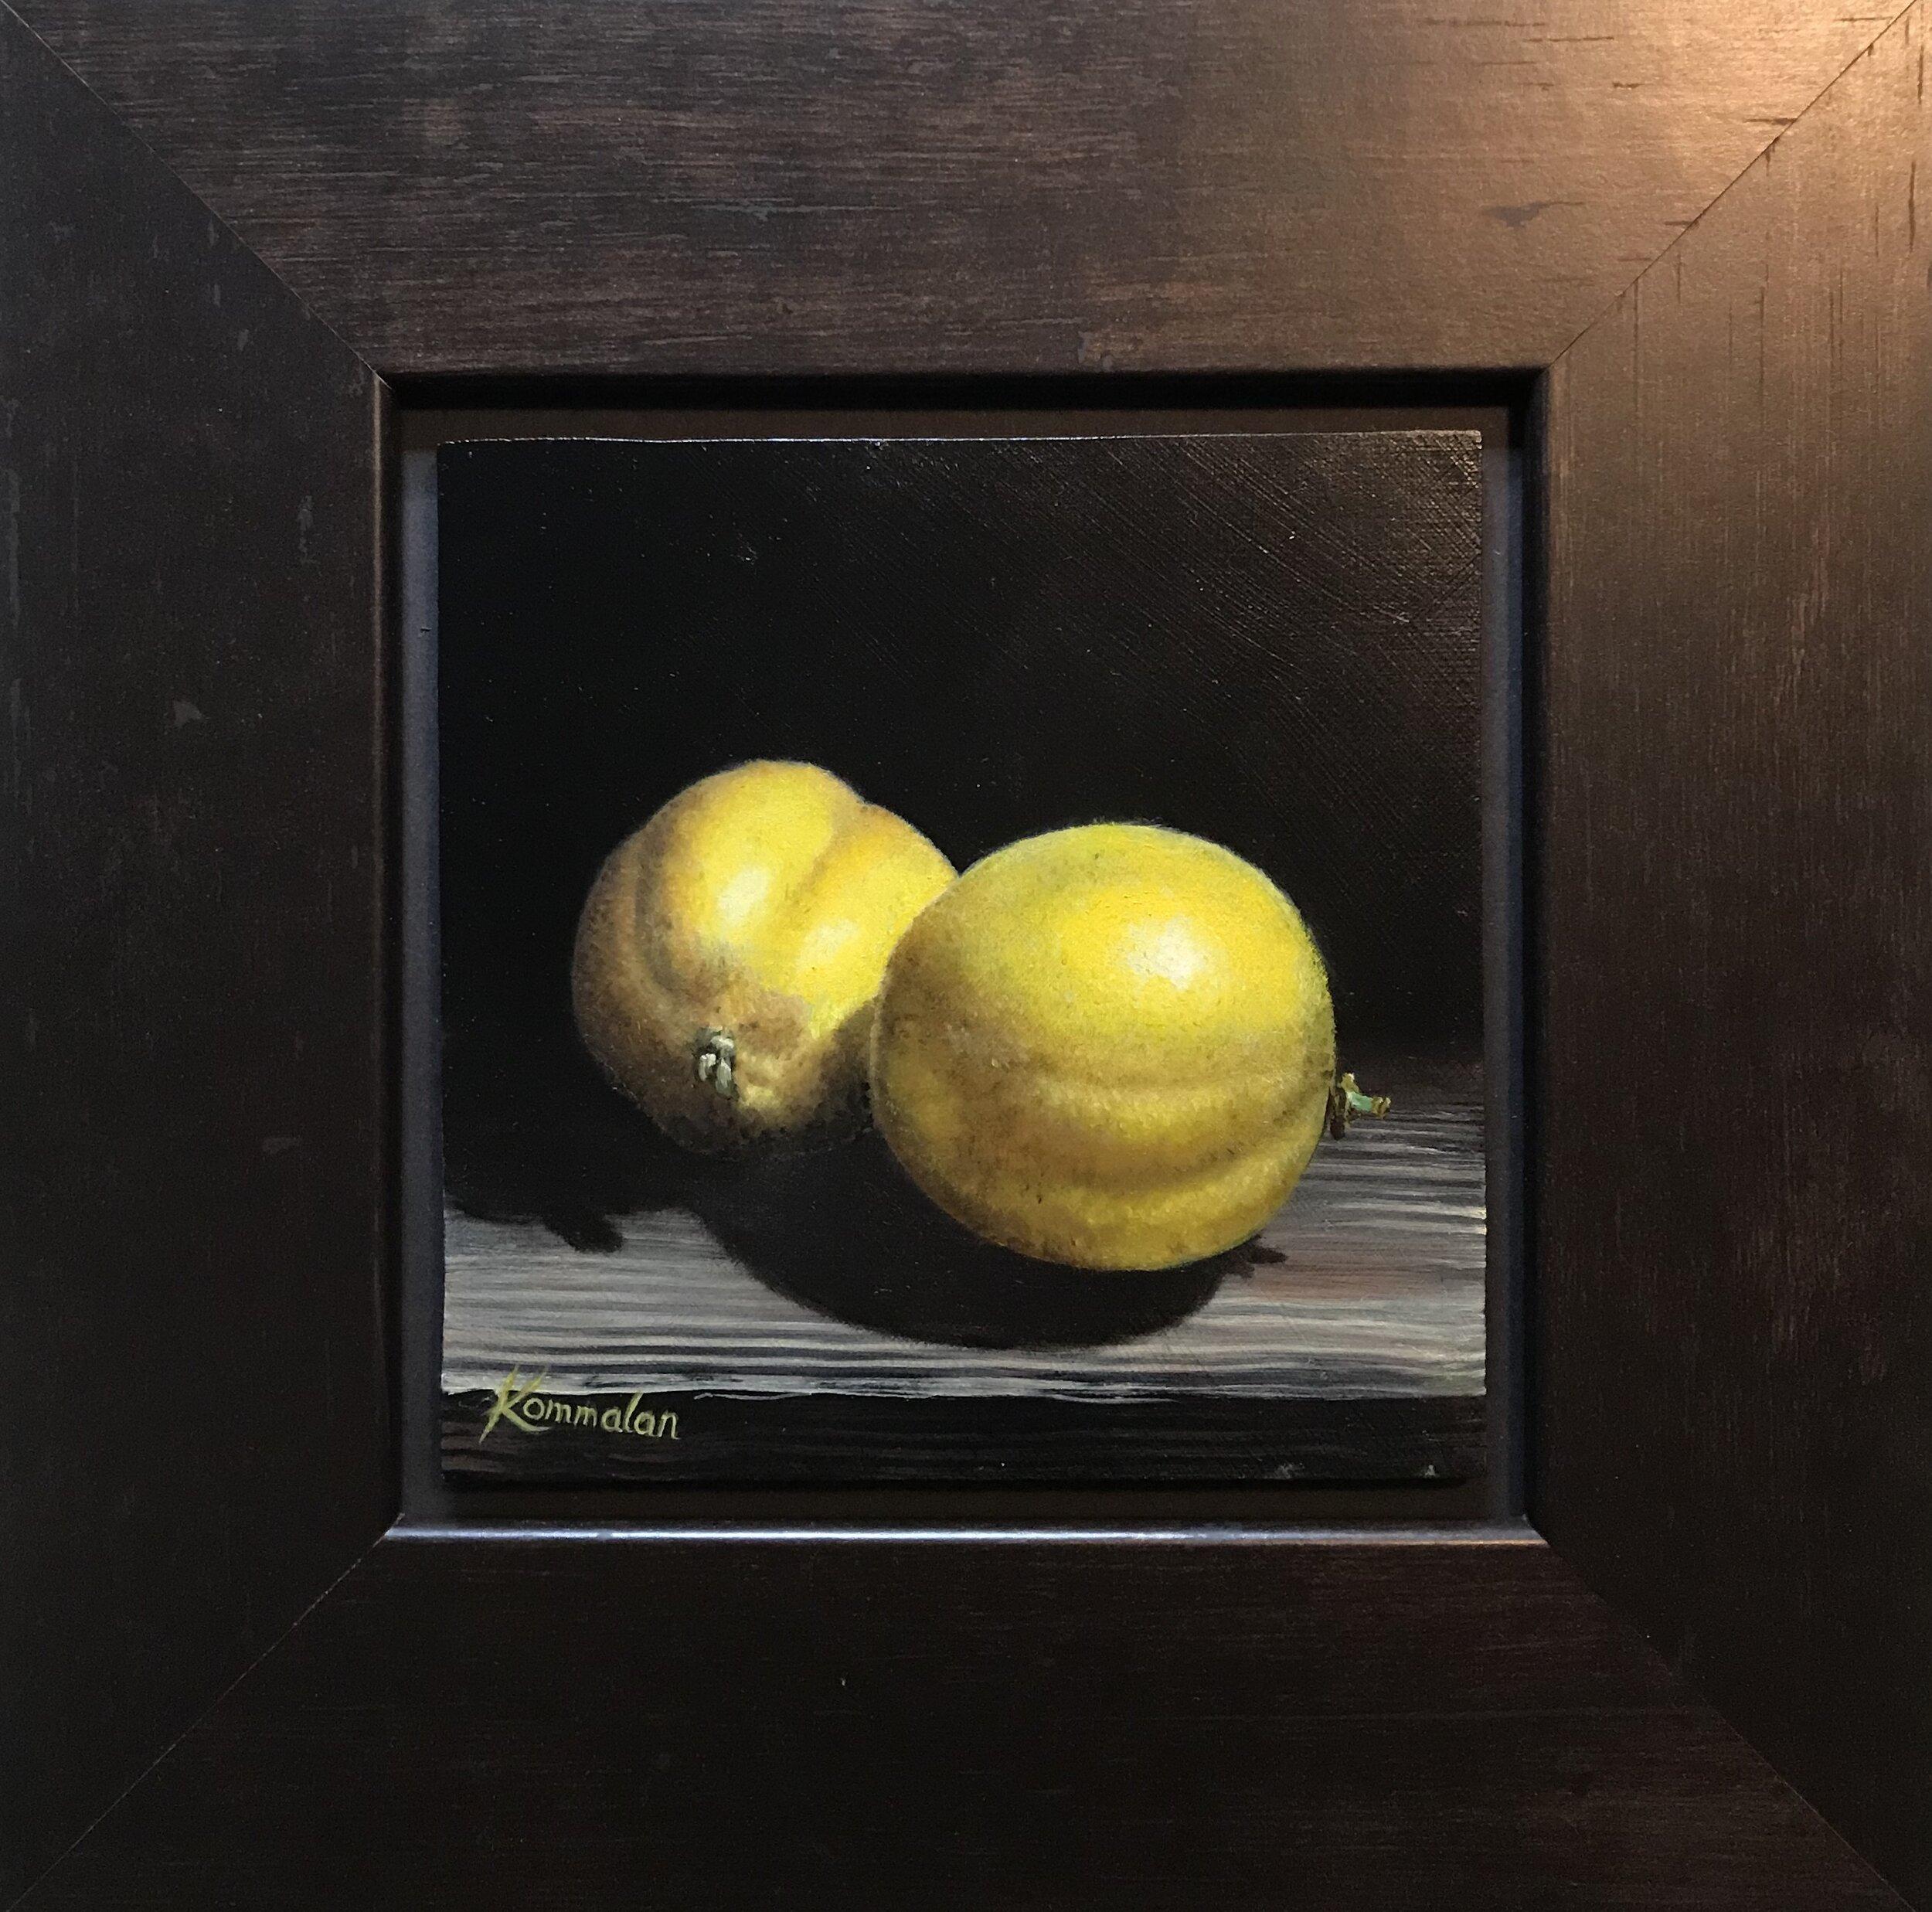 Kommalan_Two Lemons 5x5 $365.jpg